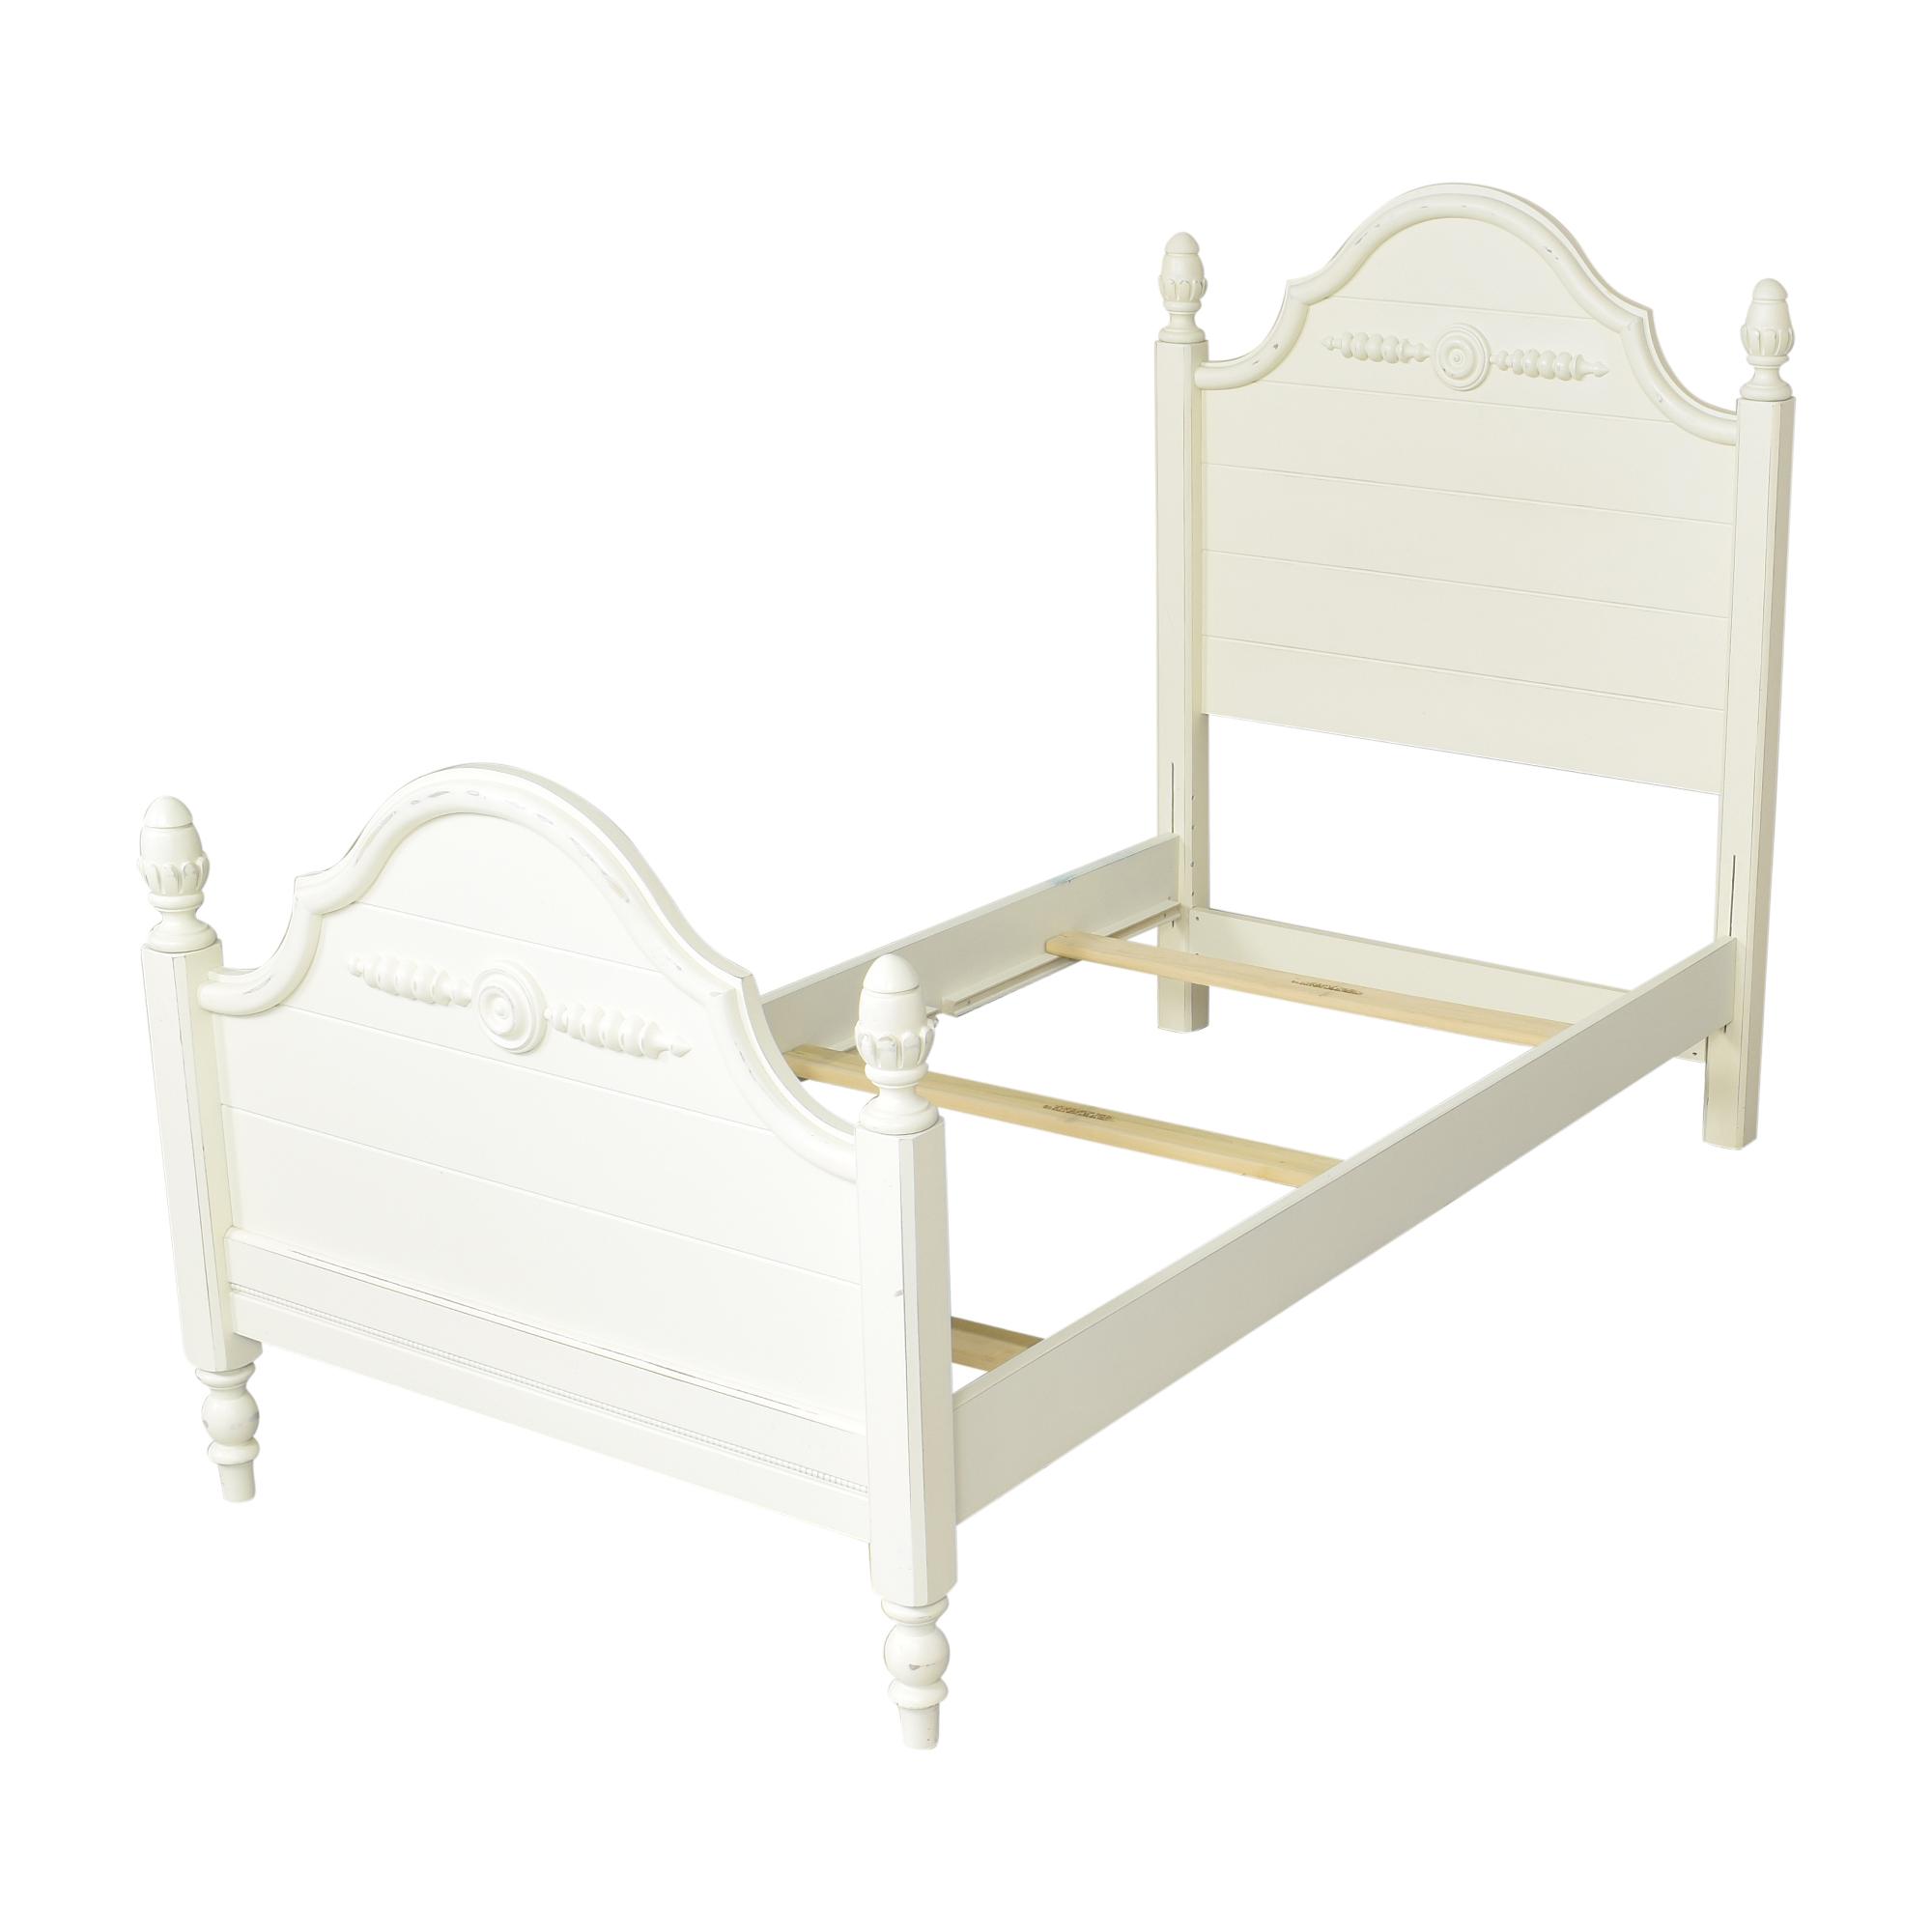 Lexington Furniture Lexington Twin Poster Bed nj